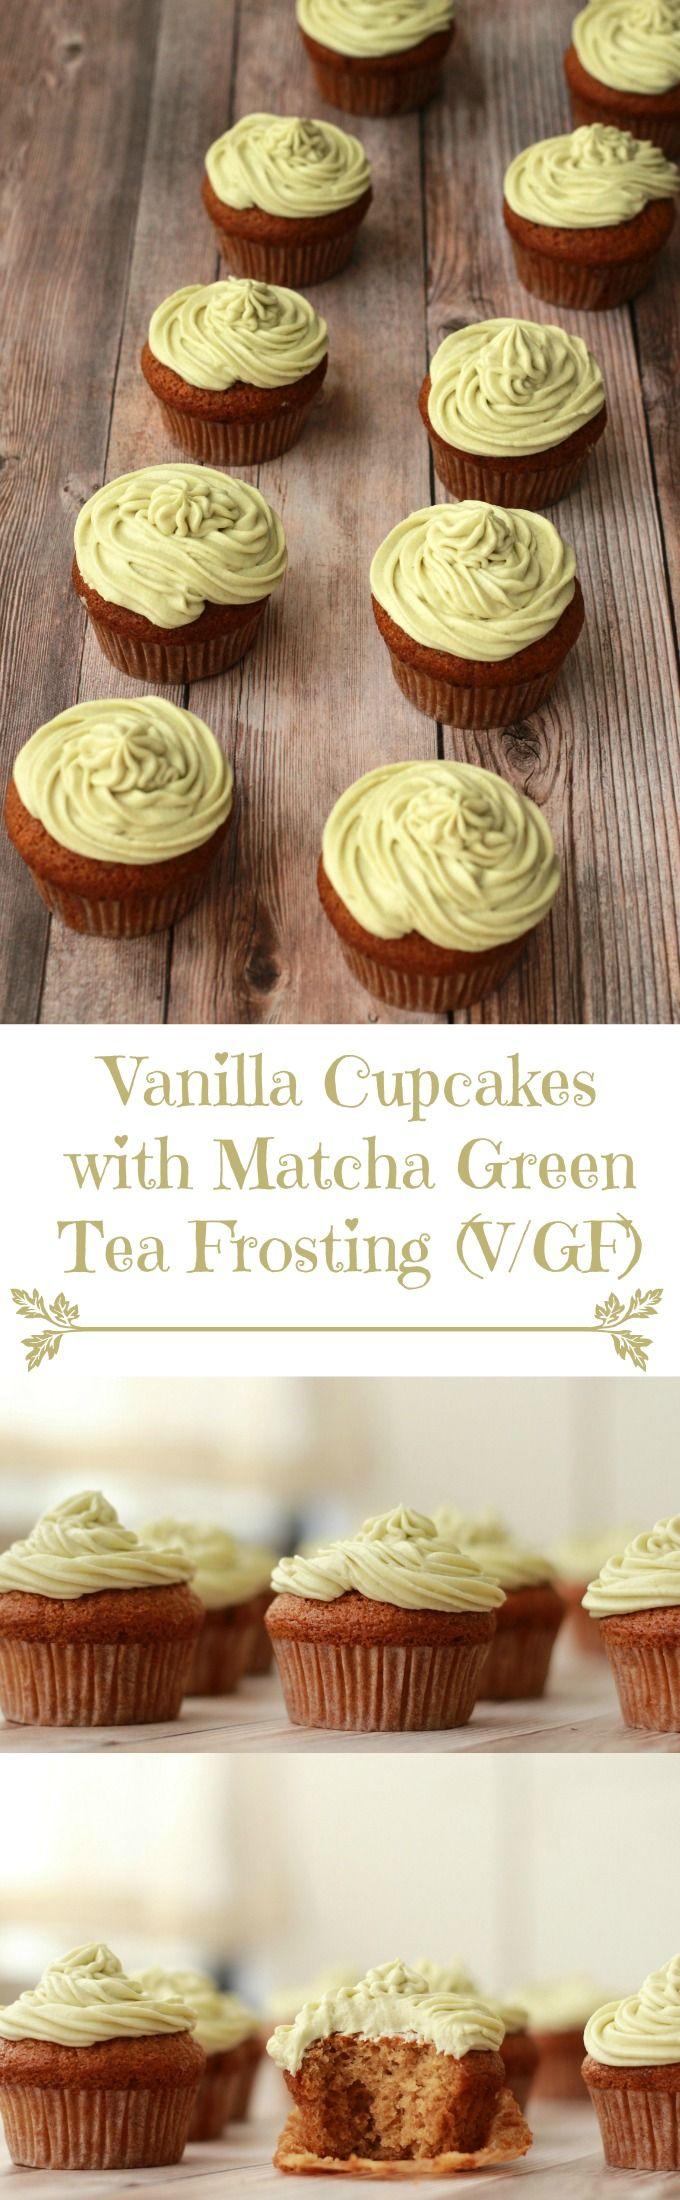 Gluten-Free & Vegan Vanilla Cupcakes with Matcha Green Tea Frosting